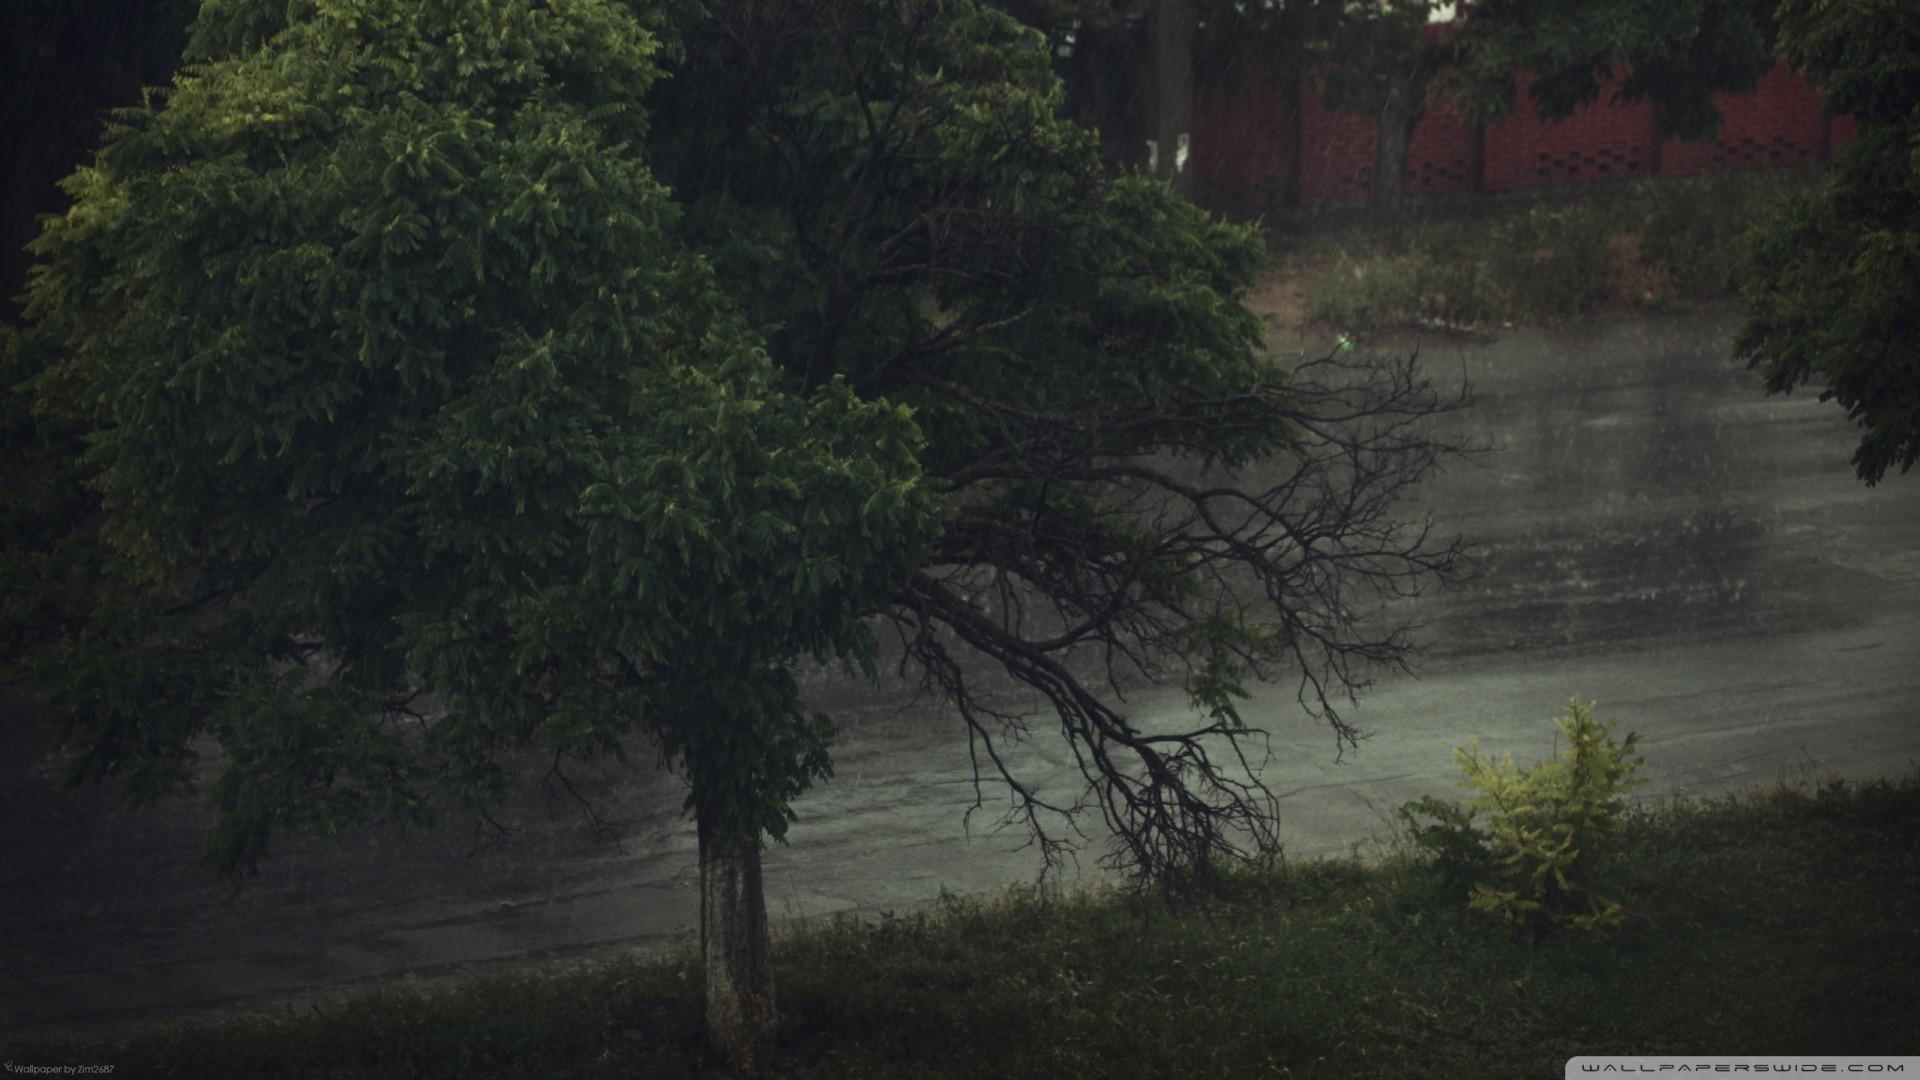 Rainy Wallpaper 72 Images